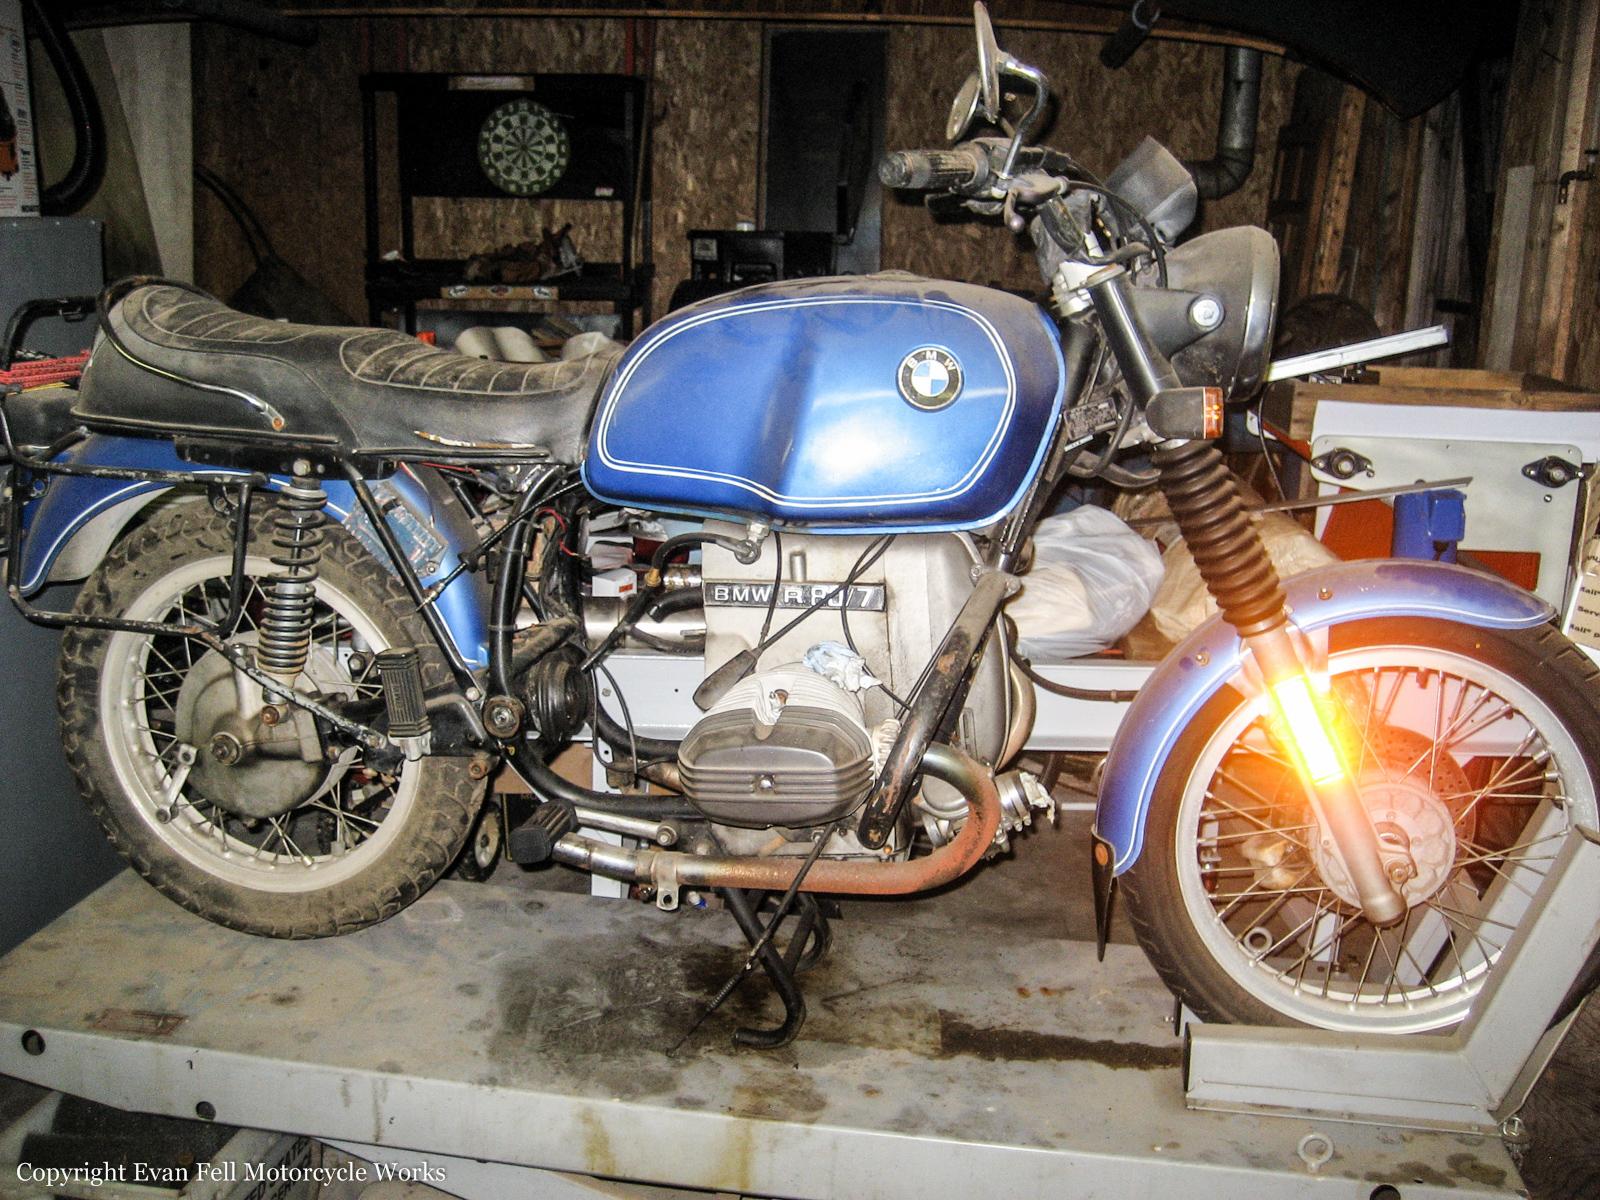 Rebuilding A Bmw R80 Airhead Transmission Evan Fell Motorcycle Works Gear Box Of 1978 Dusty